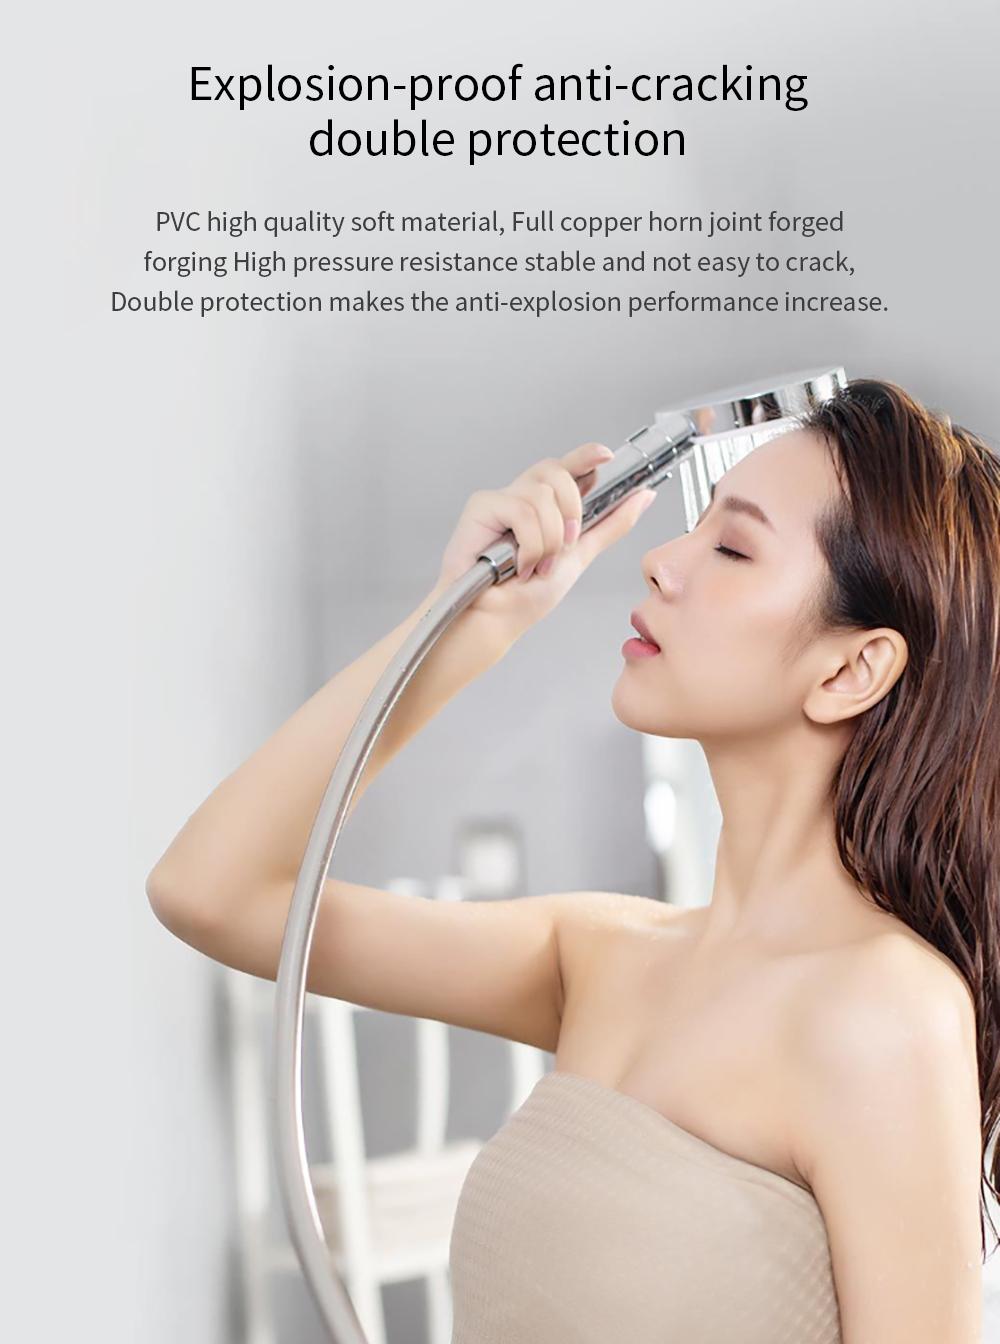 Xiaomi Diiib 3 Modes Adjustment Handheld Shower Head Set 360° 120mm 53 Water Hole with PVC Matel